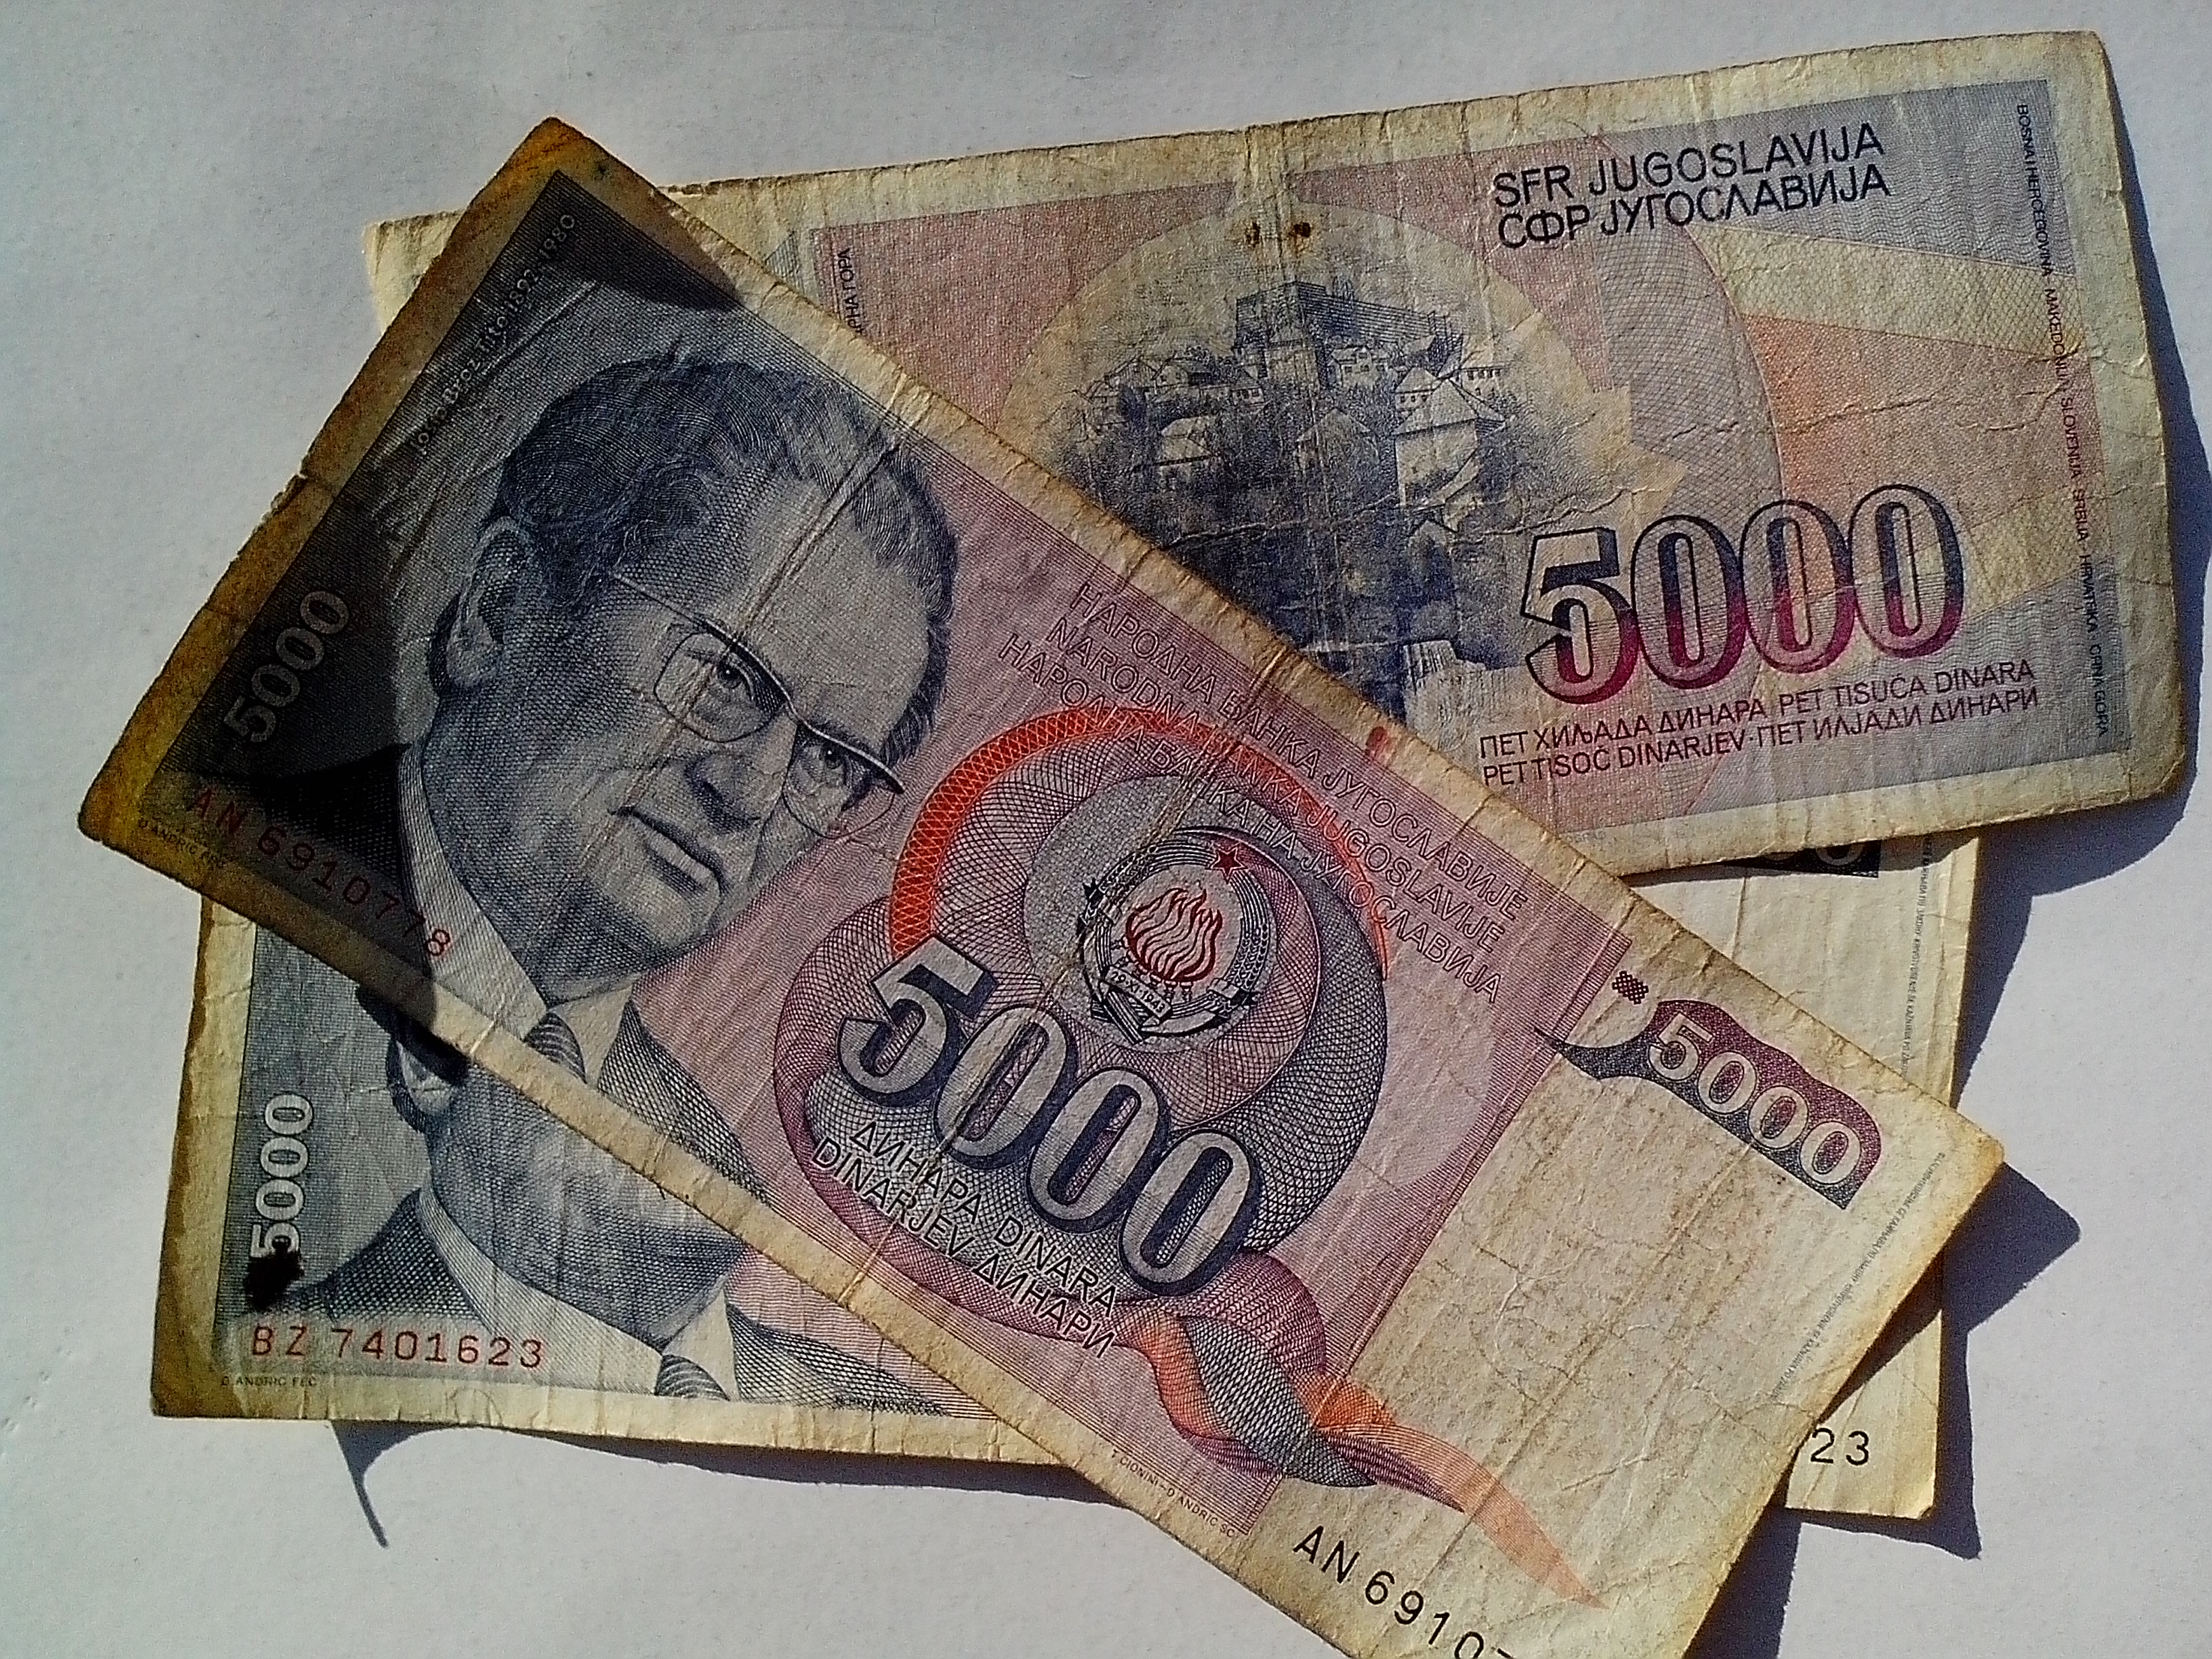 Free photograph; socialist, federal, republic, Yugoslavia, money, cash, banknotes, old